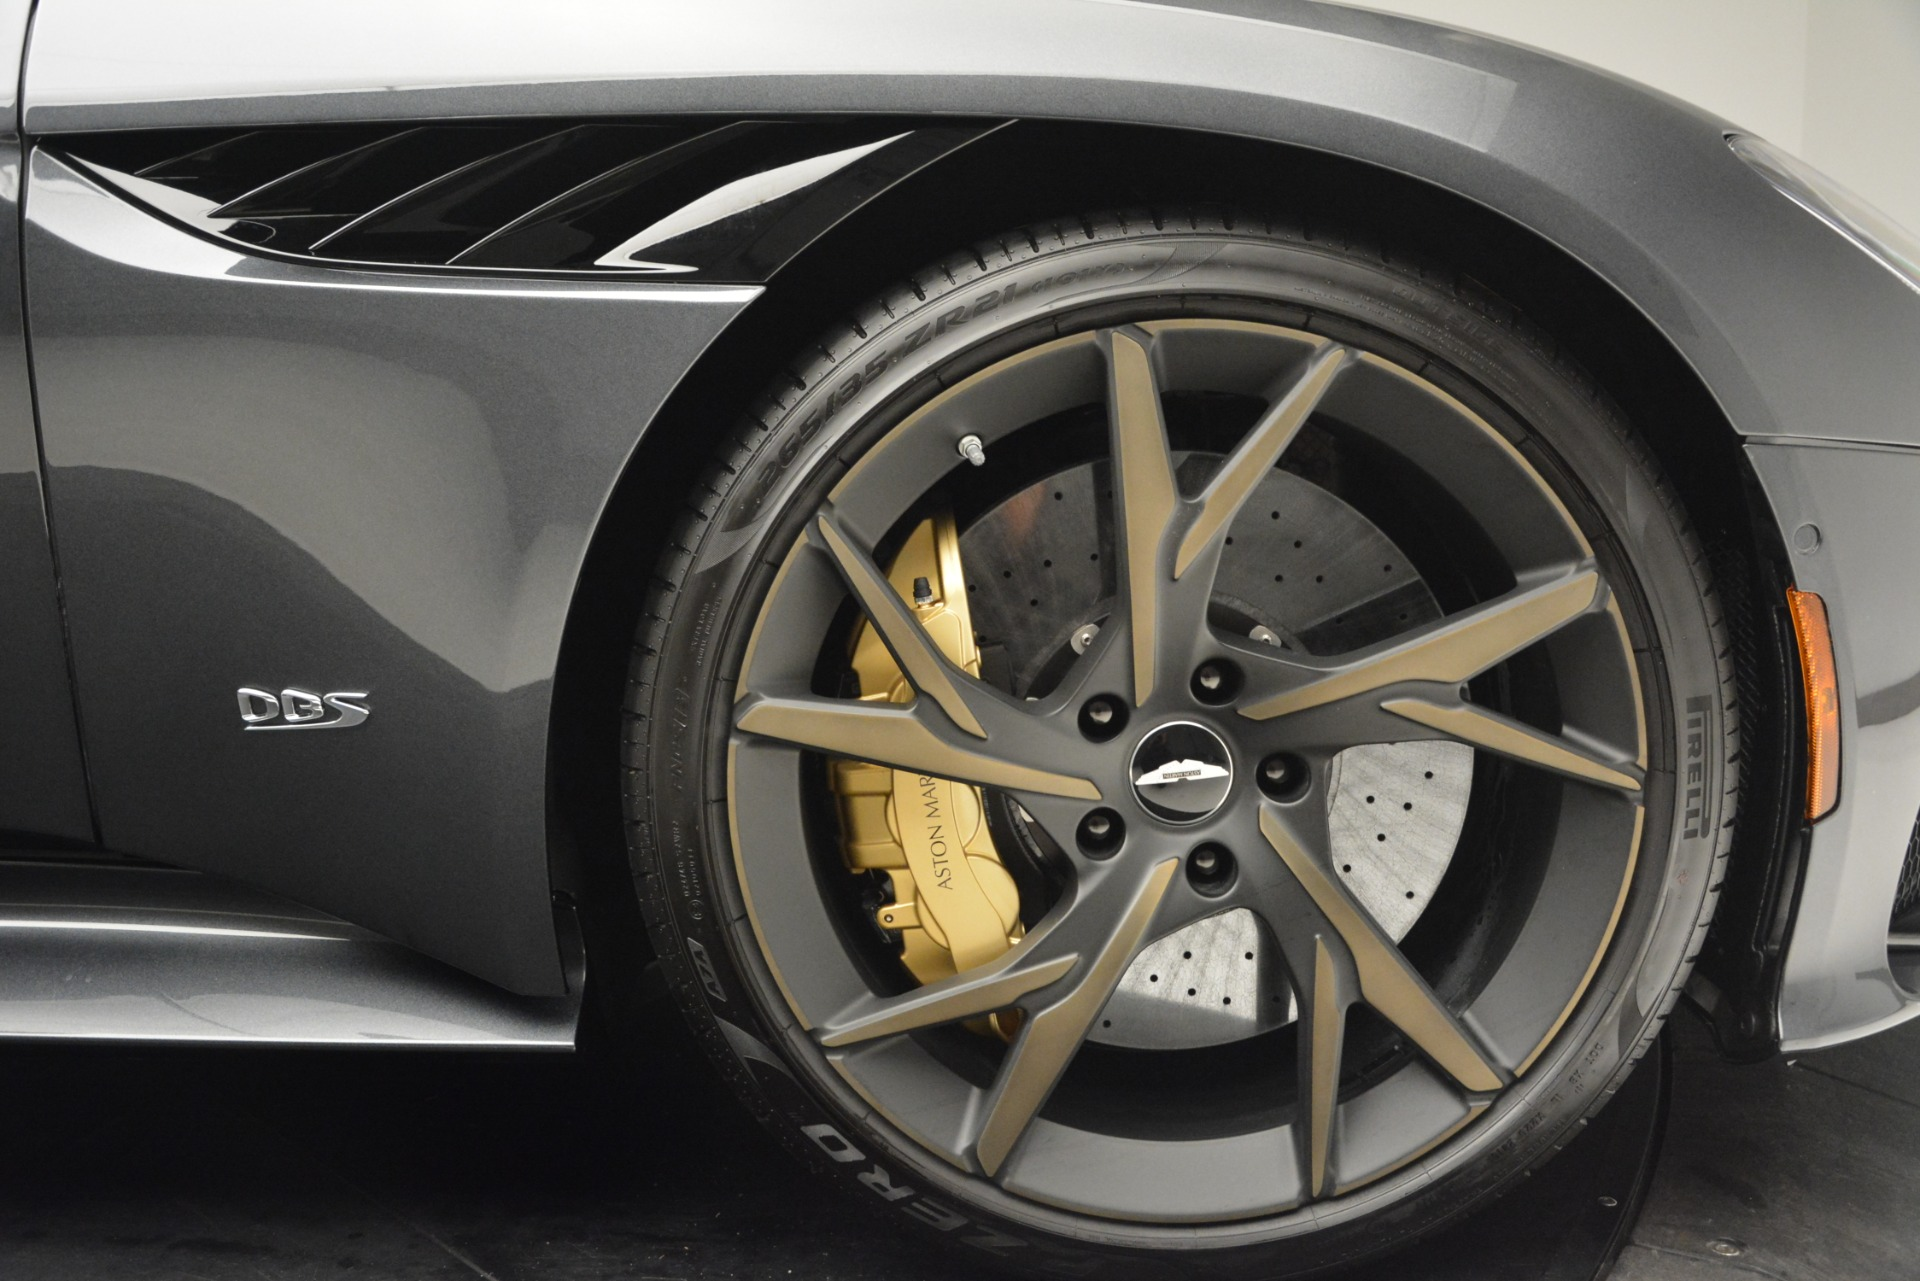 New 2019 Aston Martin DBS Superleggera For Sale In Greenwich, CT 2827_p23